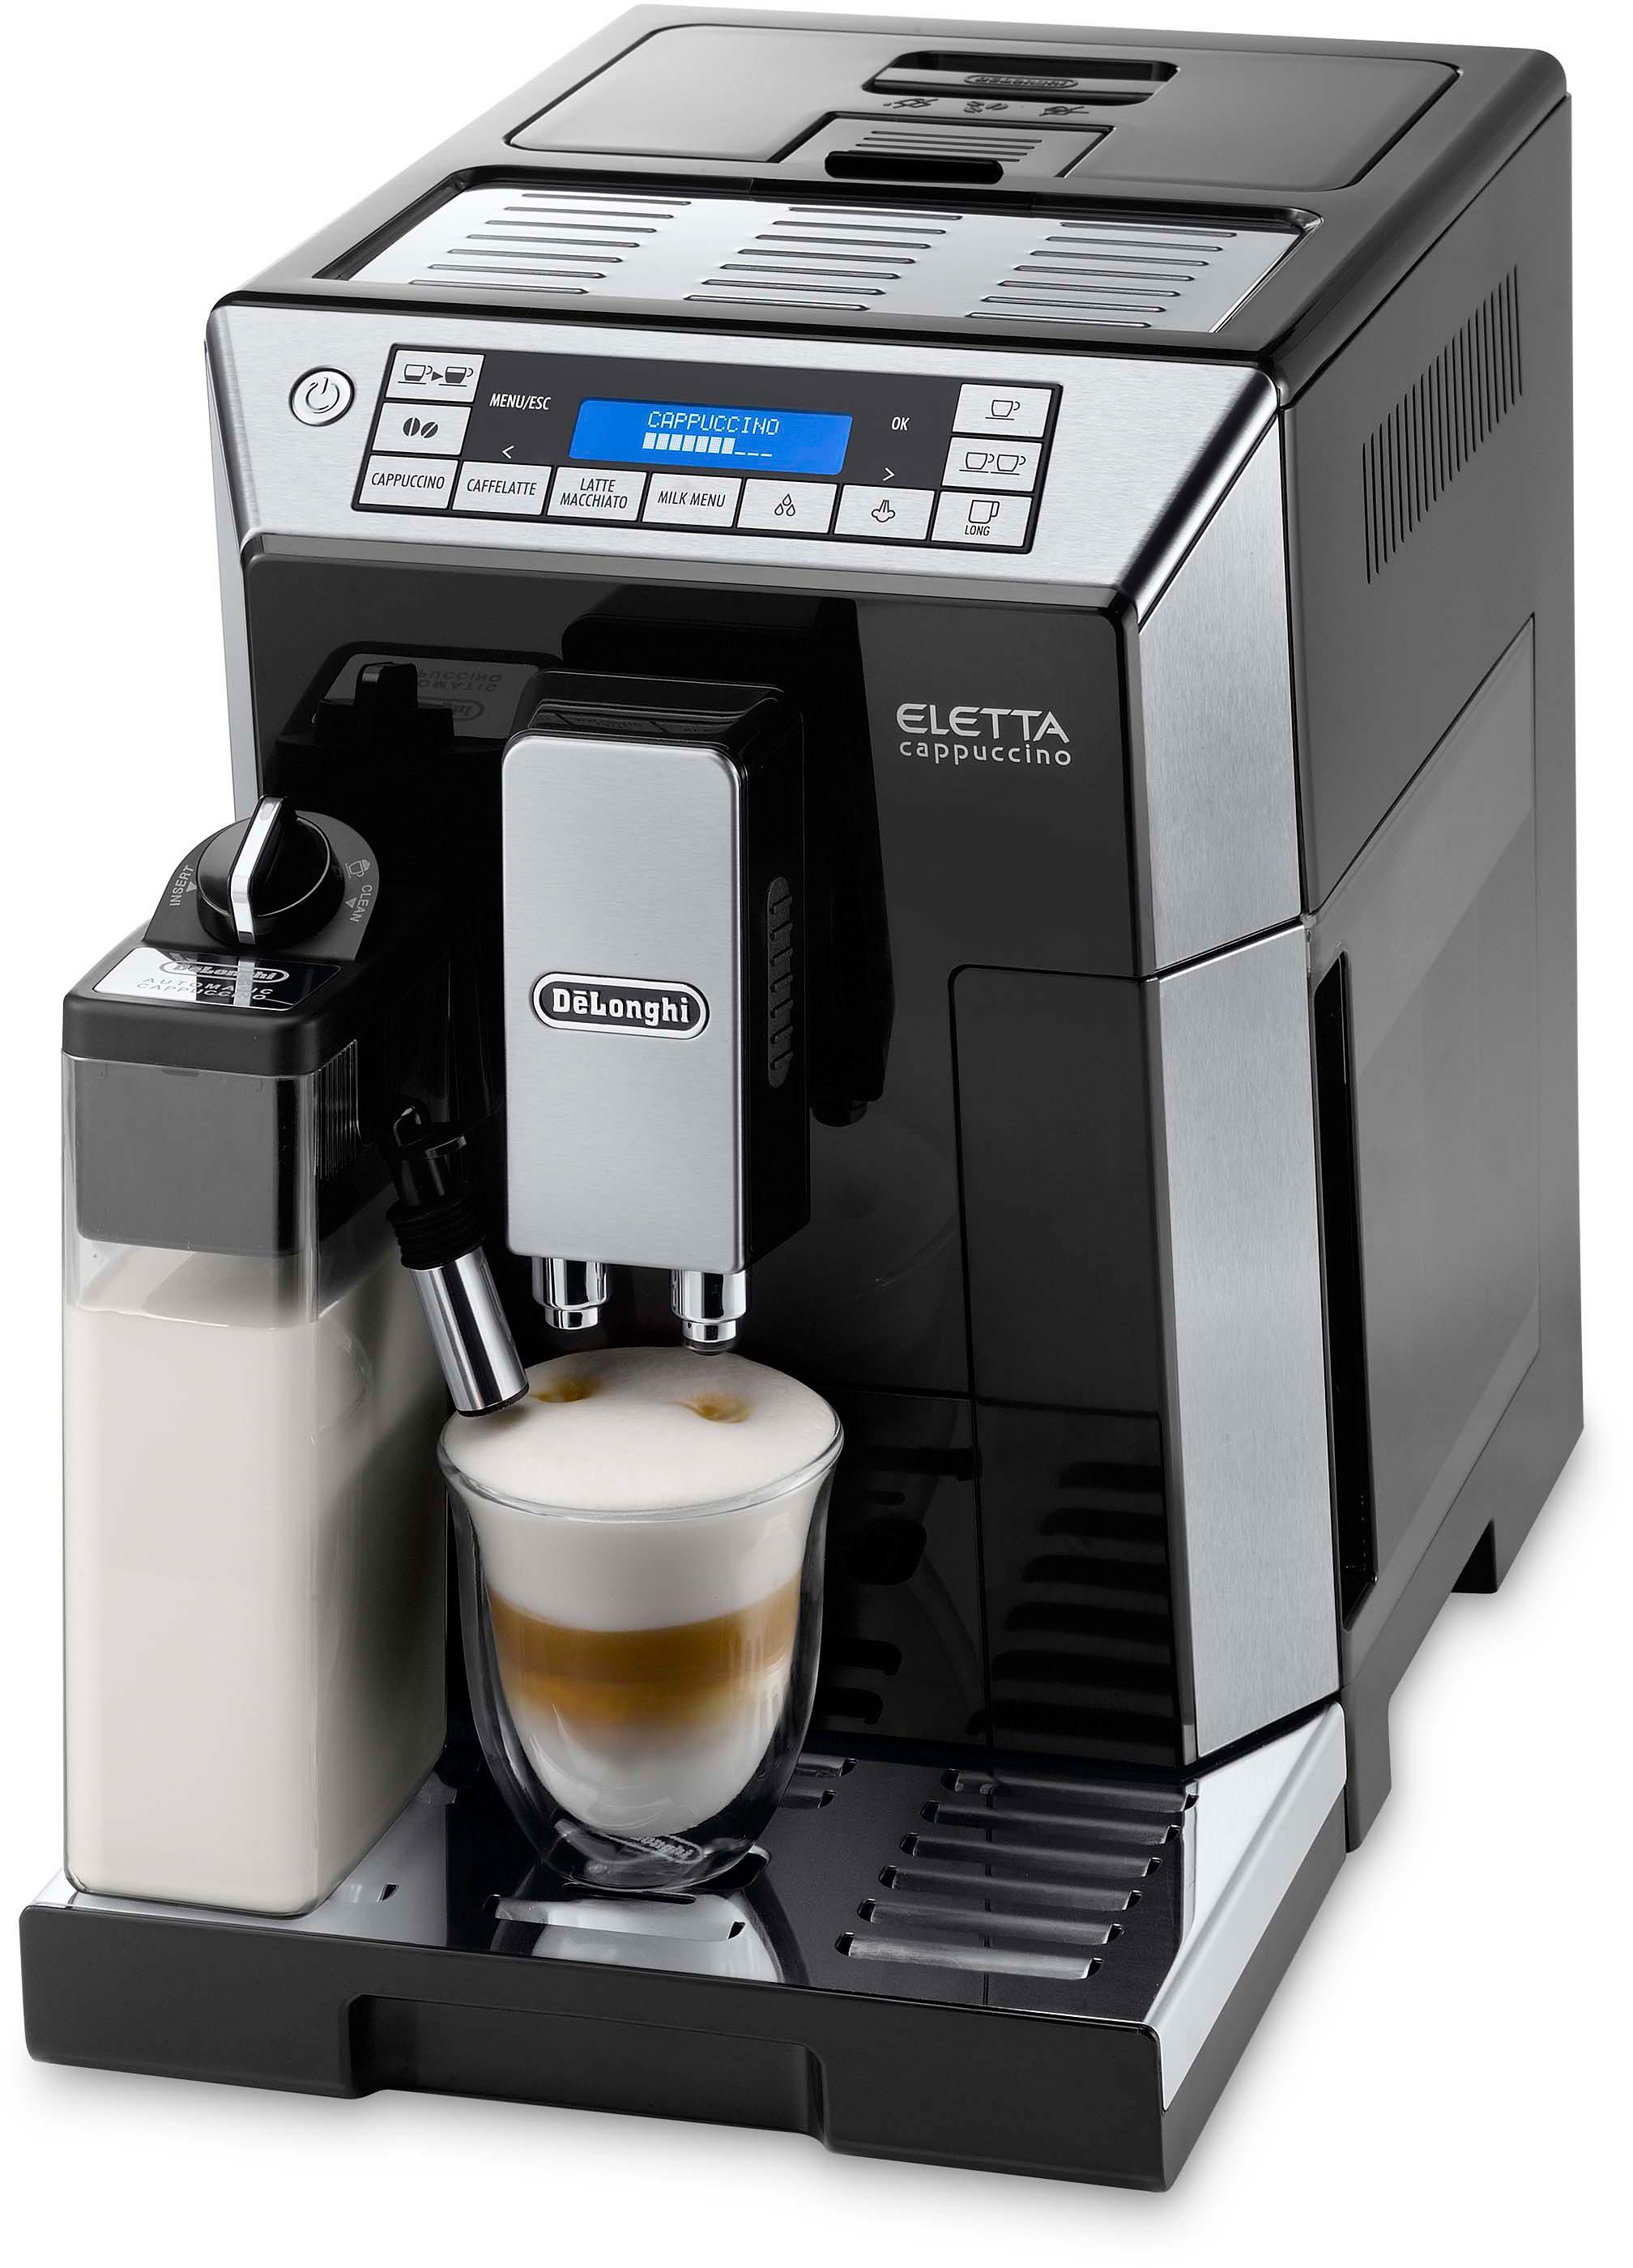 De´Longhi Kaffeevollautomat ECAM 45.766B ELETTA, 1,9l Tank, Kegelmahlwerk | Küche und Esszimmer > Kaffee und Tee > Kaffeevollautomaten | Schwarz | DELONGHI